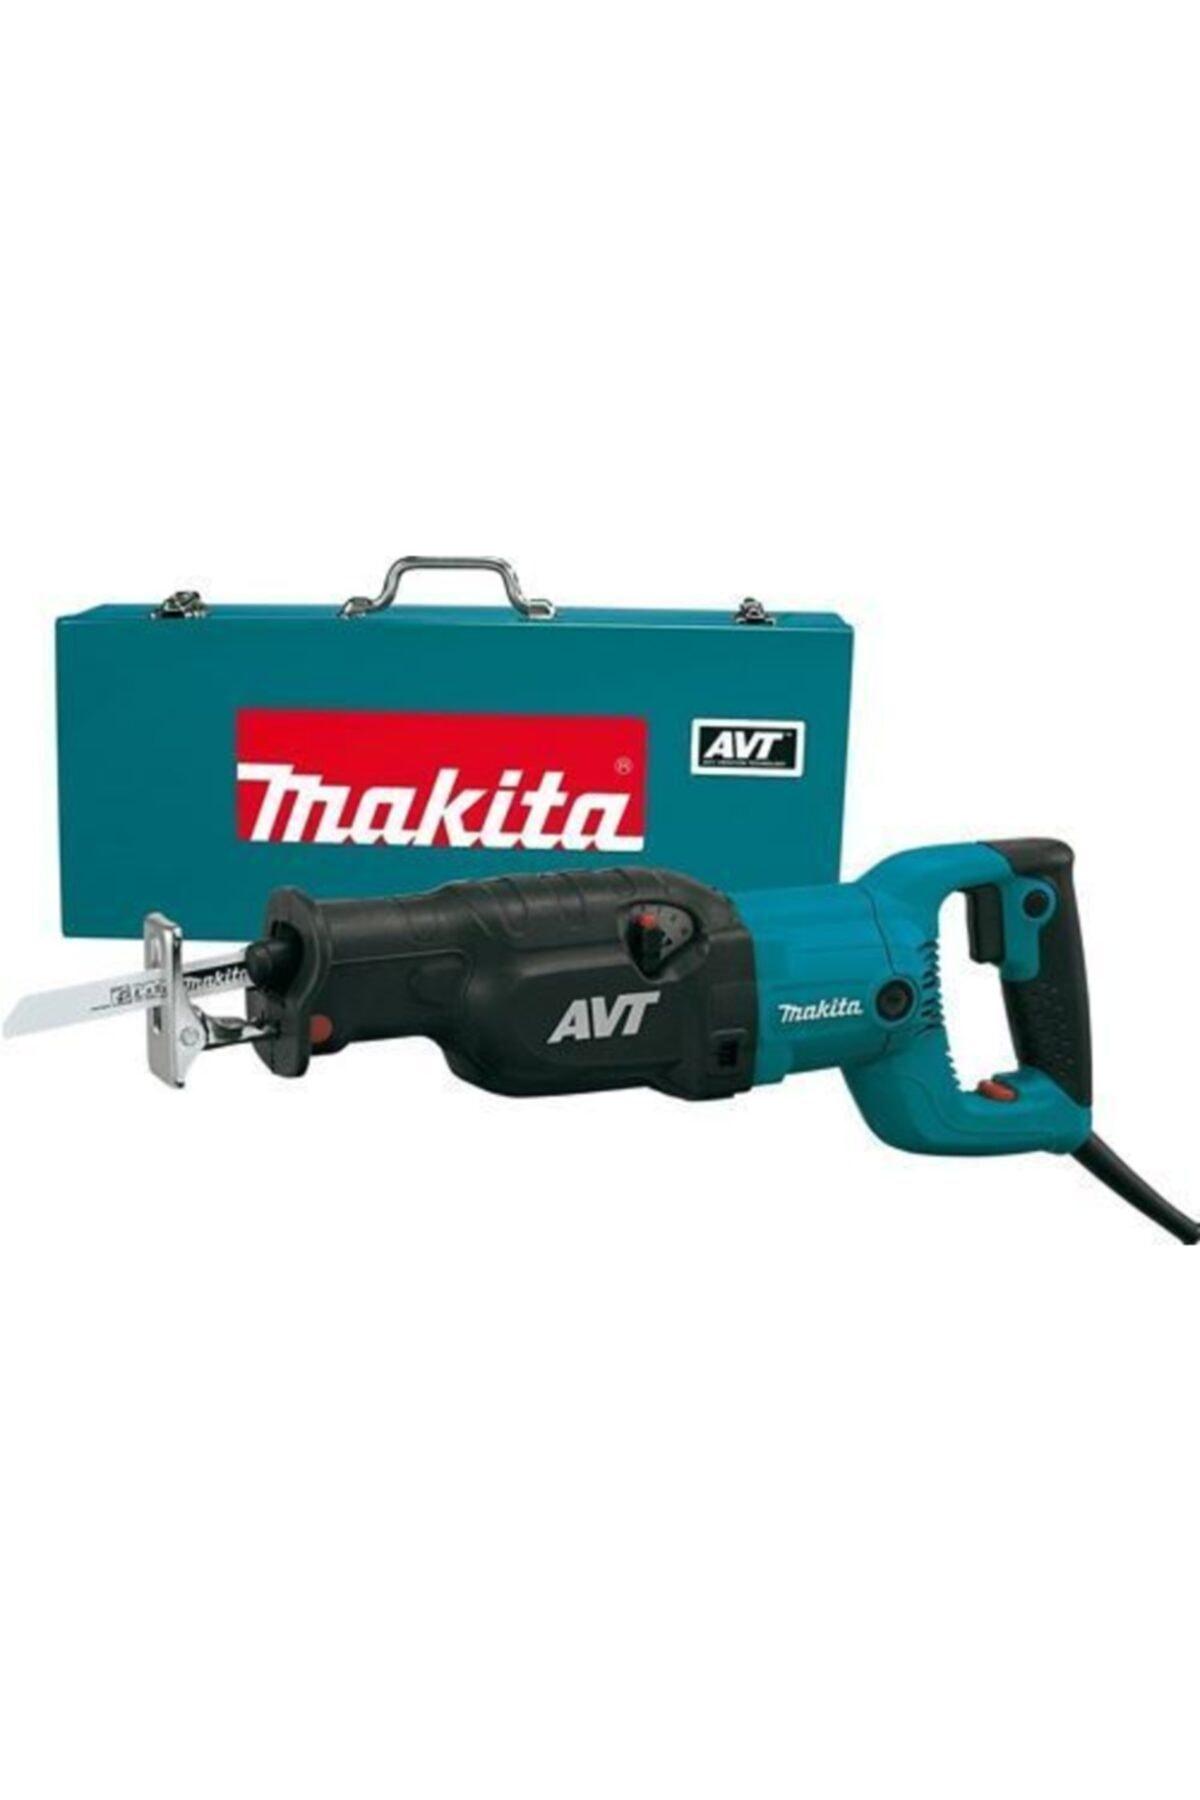 Makita Jr3070ct 1510 Watt Avt'li Sarkaç Hareketli Kılıç Testere 1